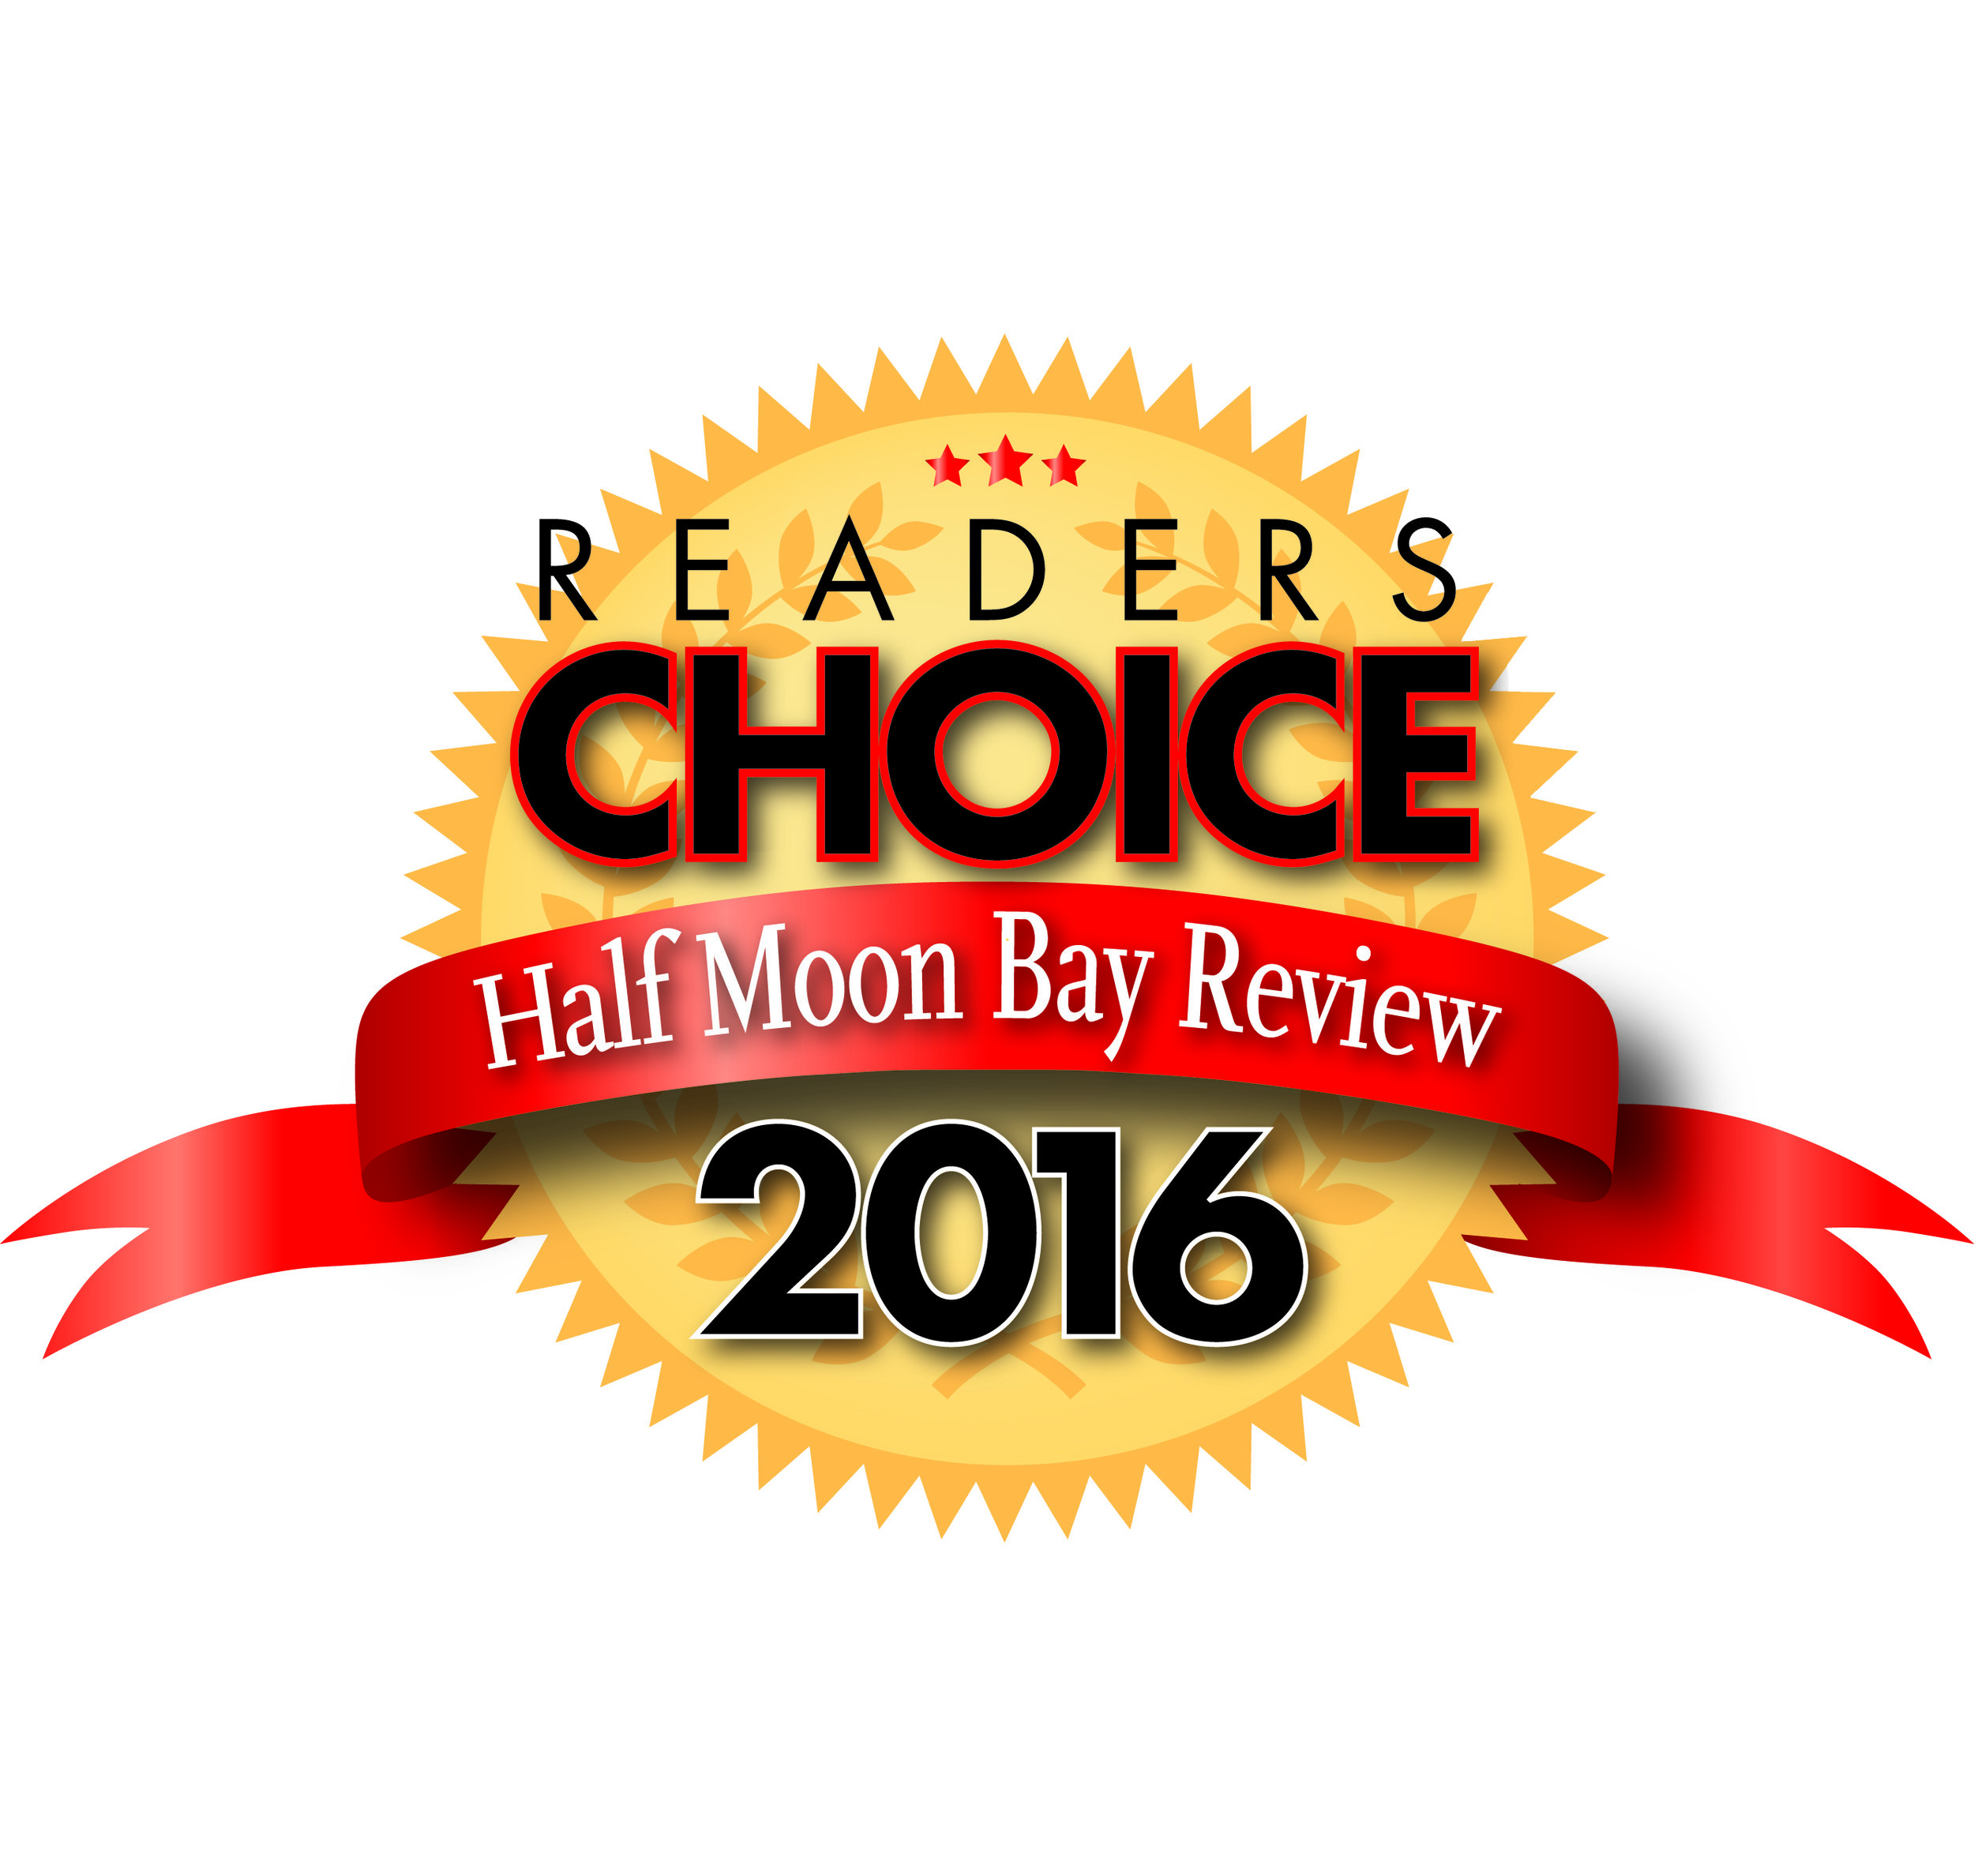 Readers Choice_2016_logo.jpg